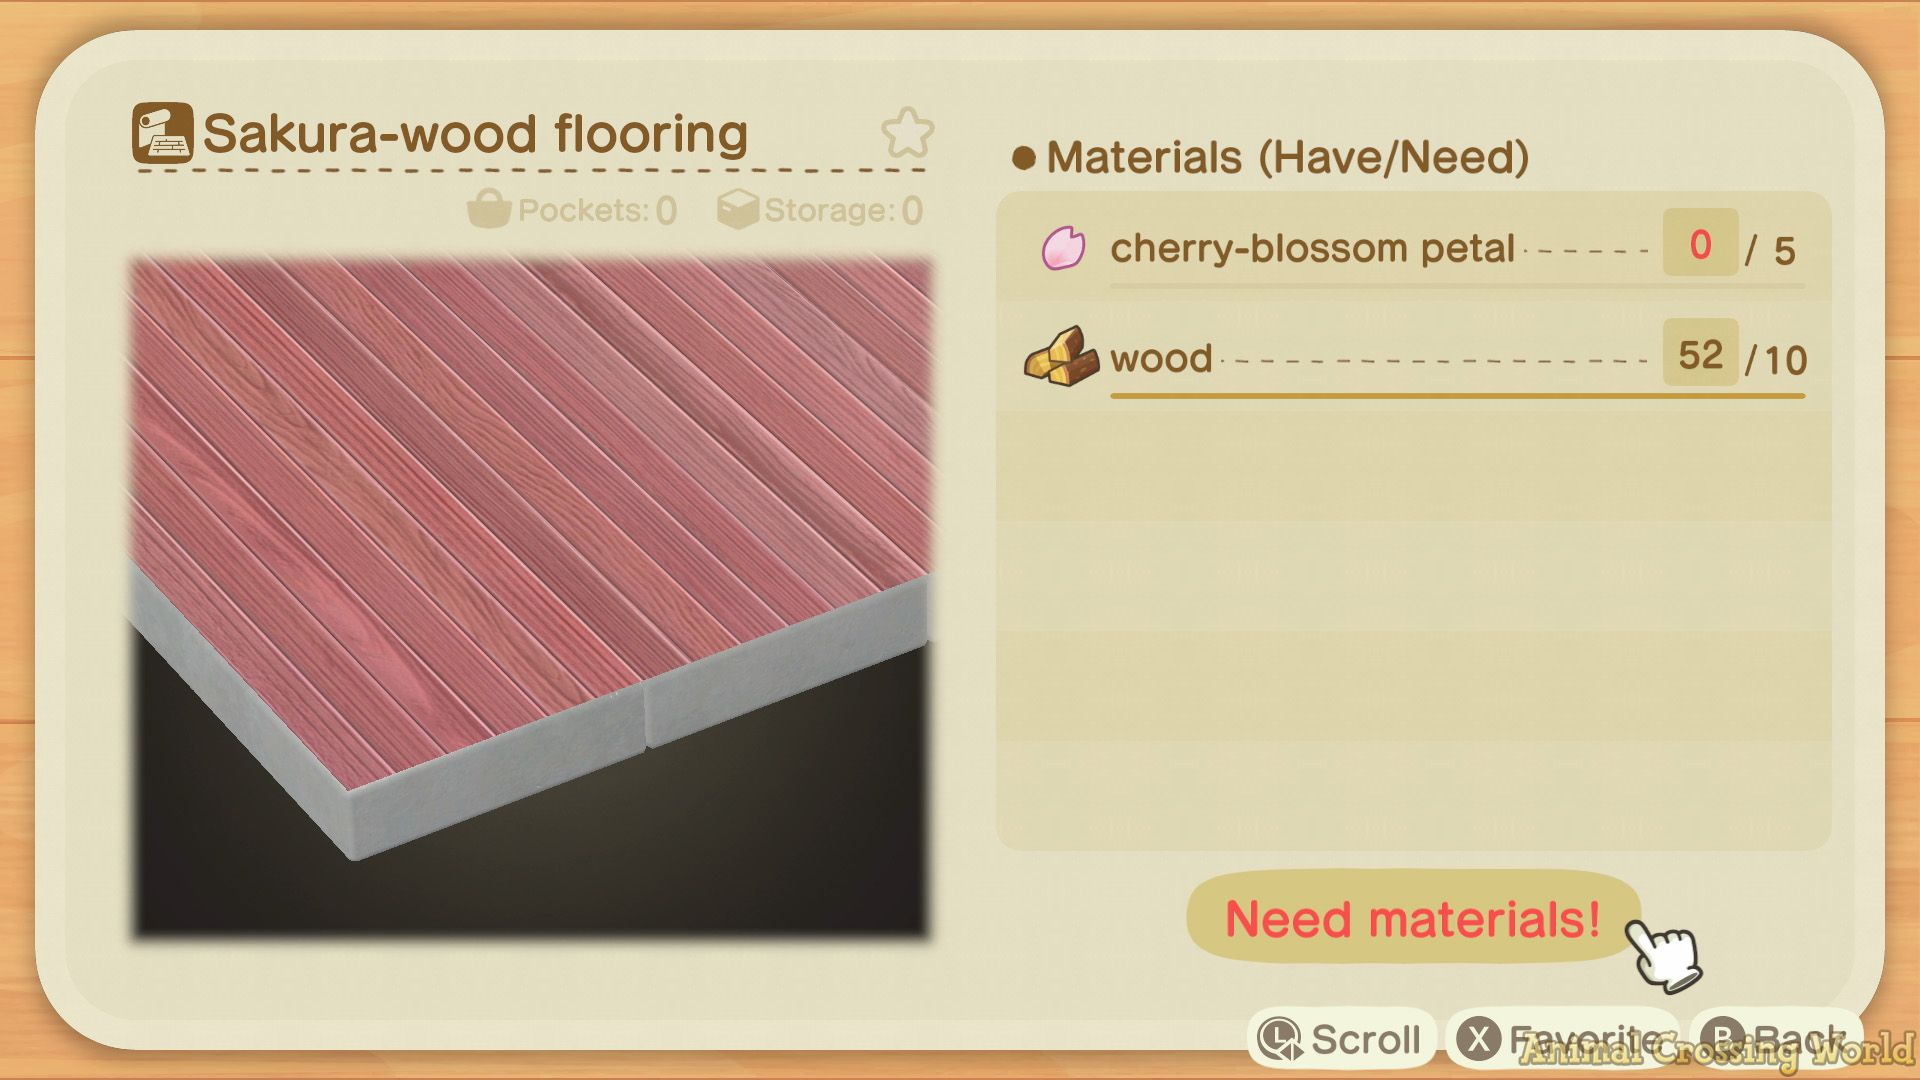 Any Cherry Blossom Diy Recipe Same Day Delivery Animal Etsy Animal Crossing Tree Wallpaper Diy Food Recipes